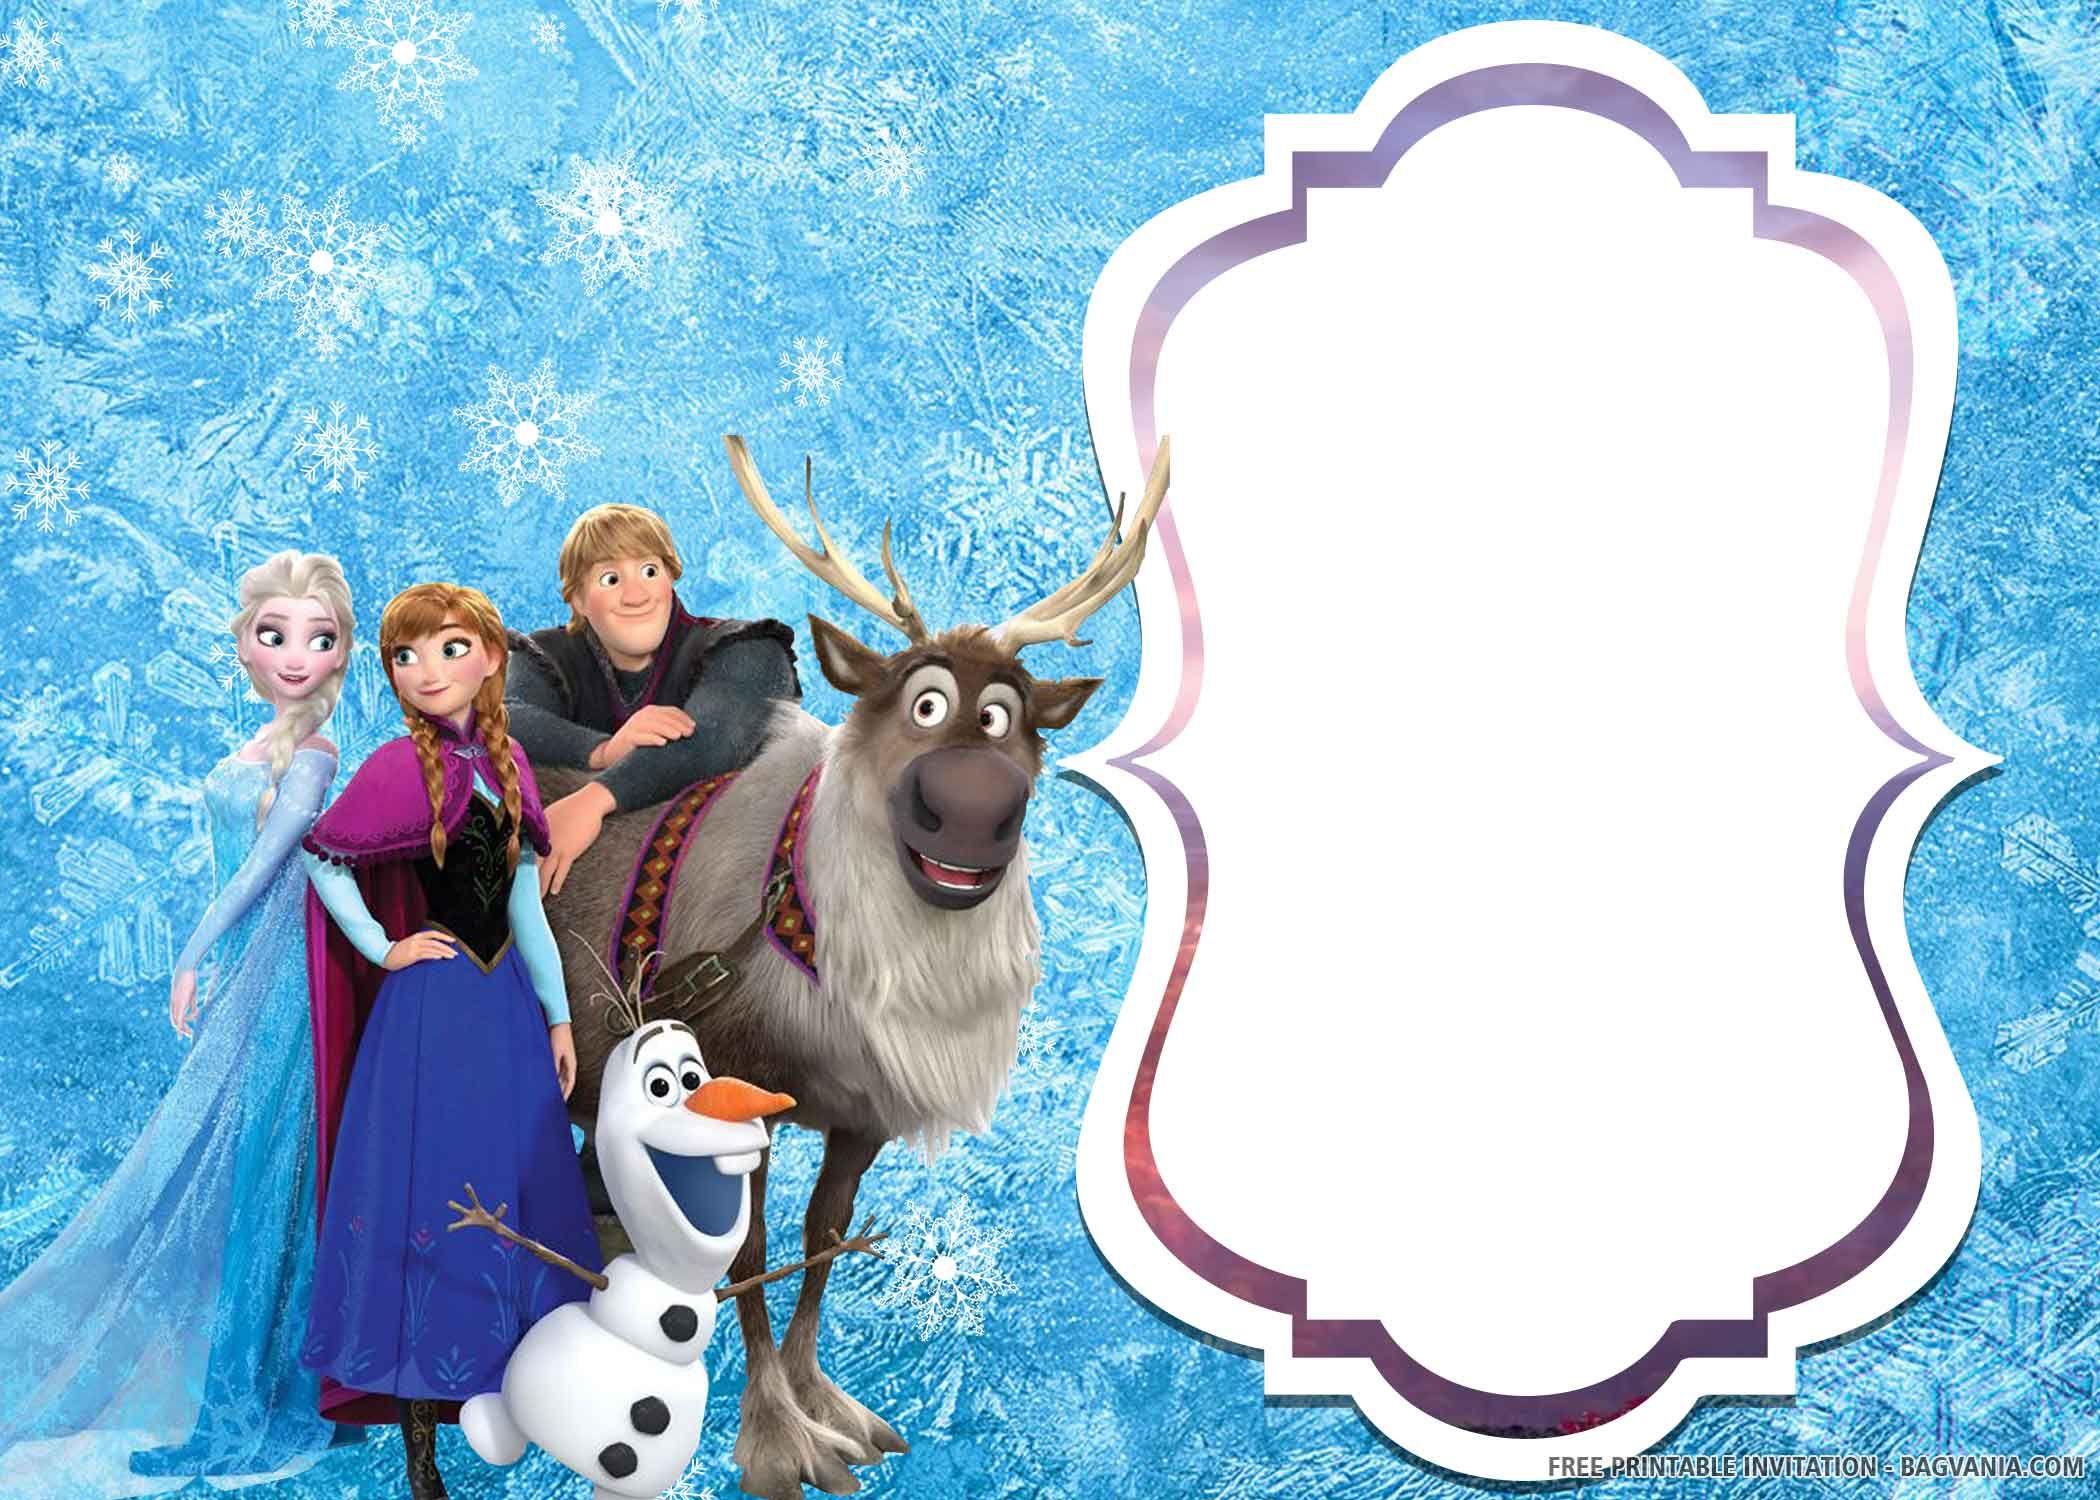 Frozen 2 Free Printable Invitations